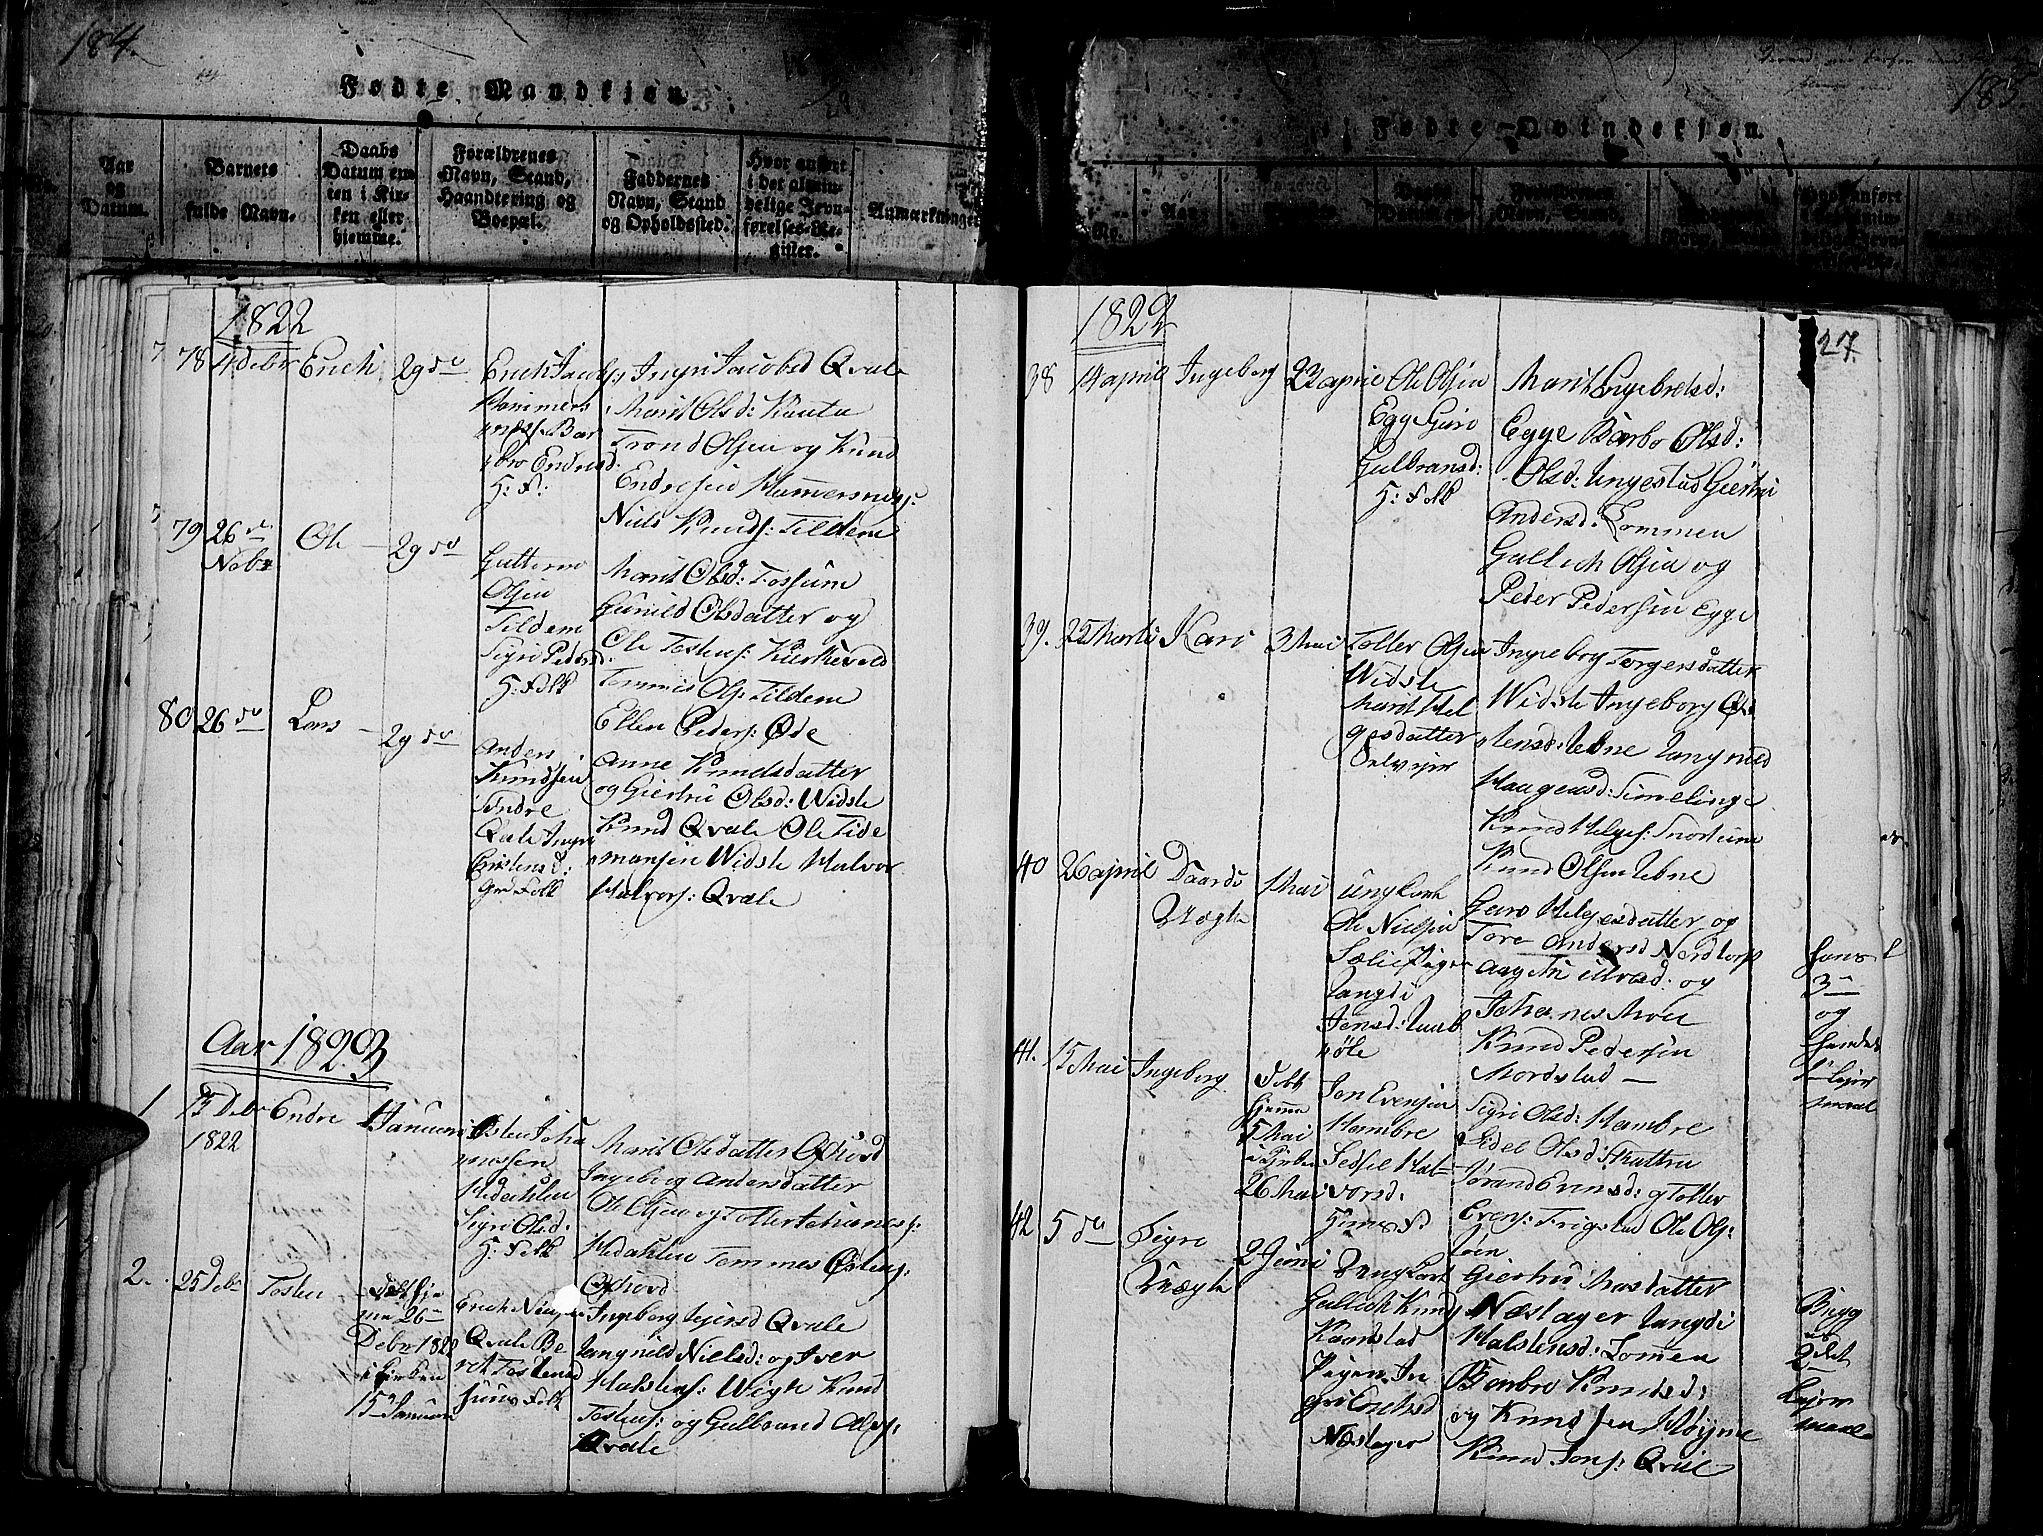 SAH, Slidre prestekontor, Ministerialbok nr. 2, 1814-1830, s. 185a